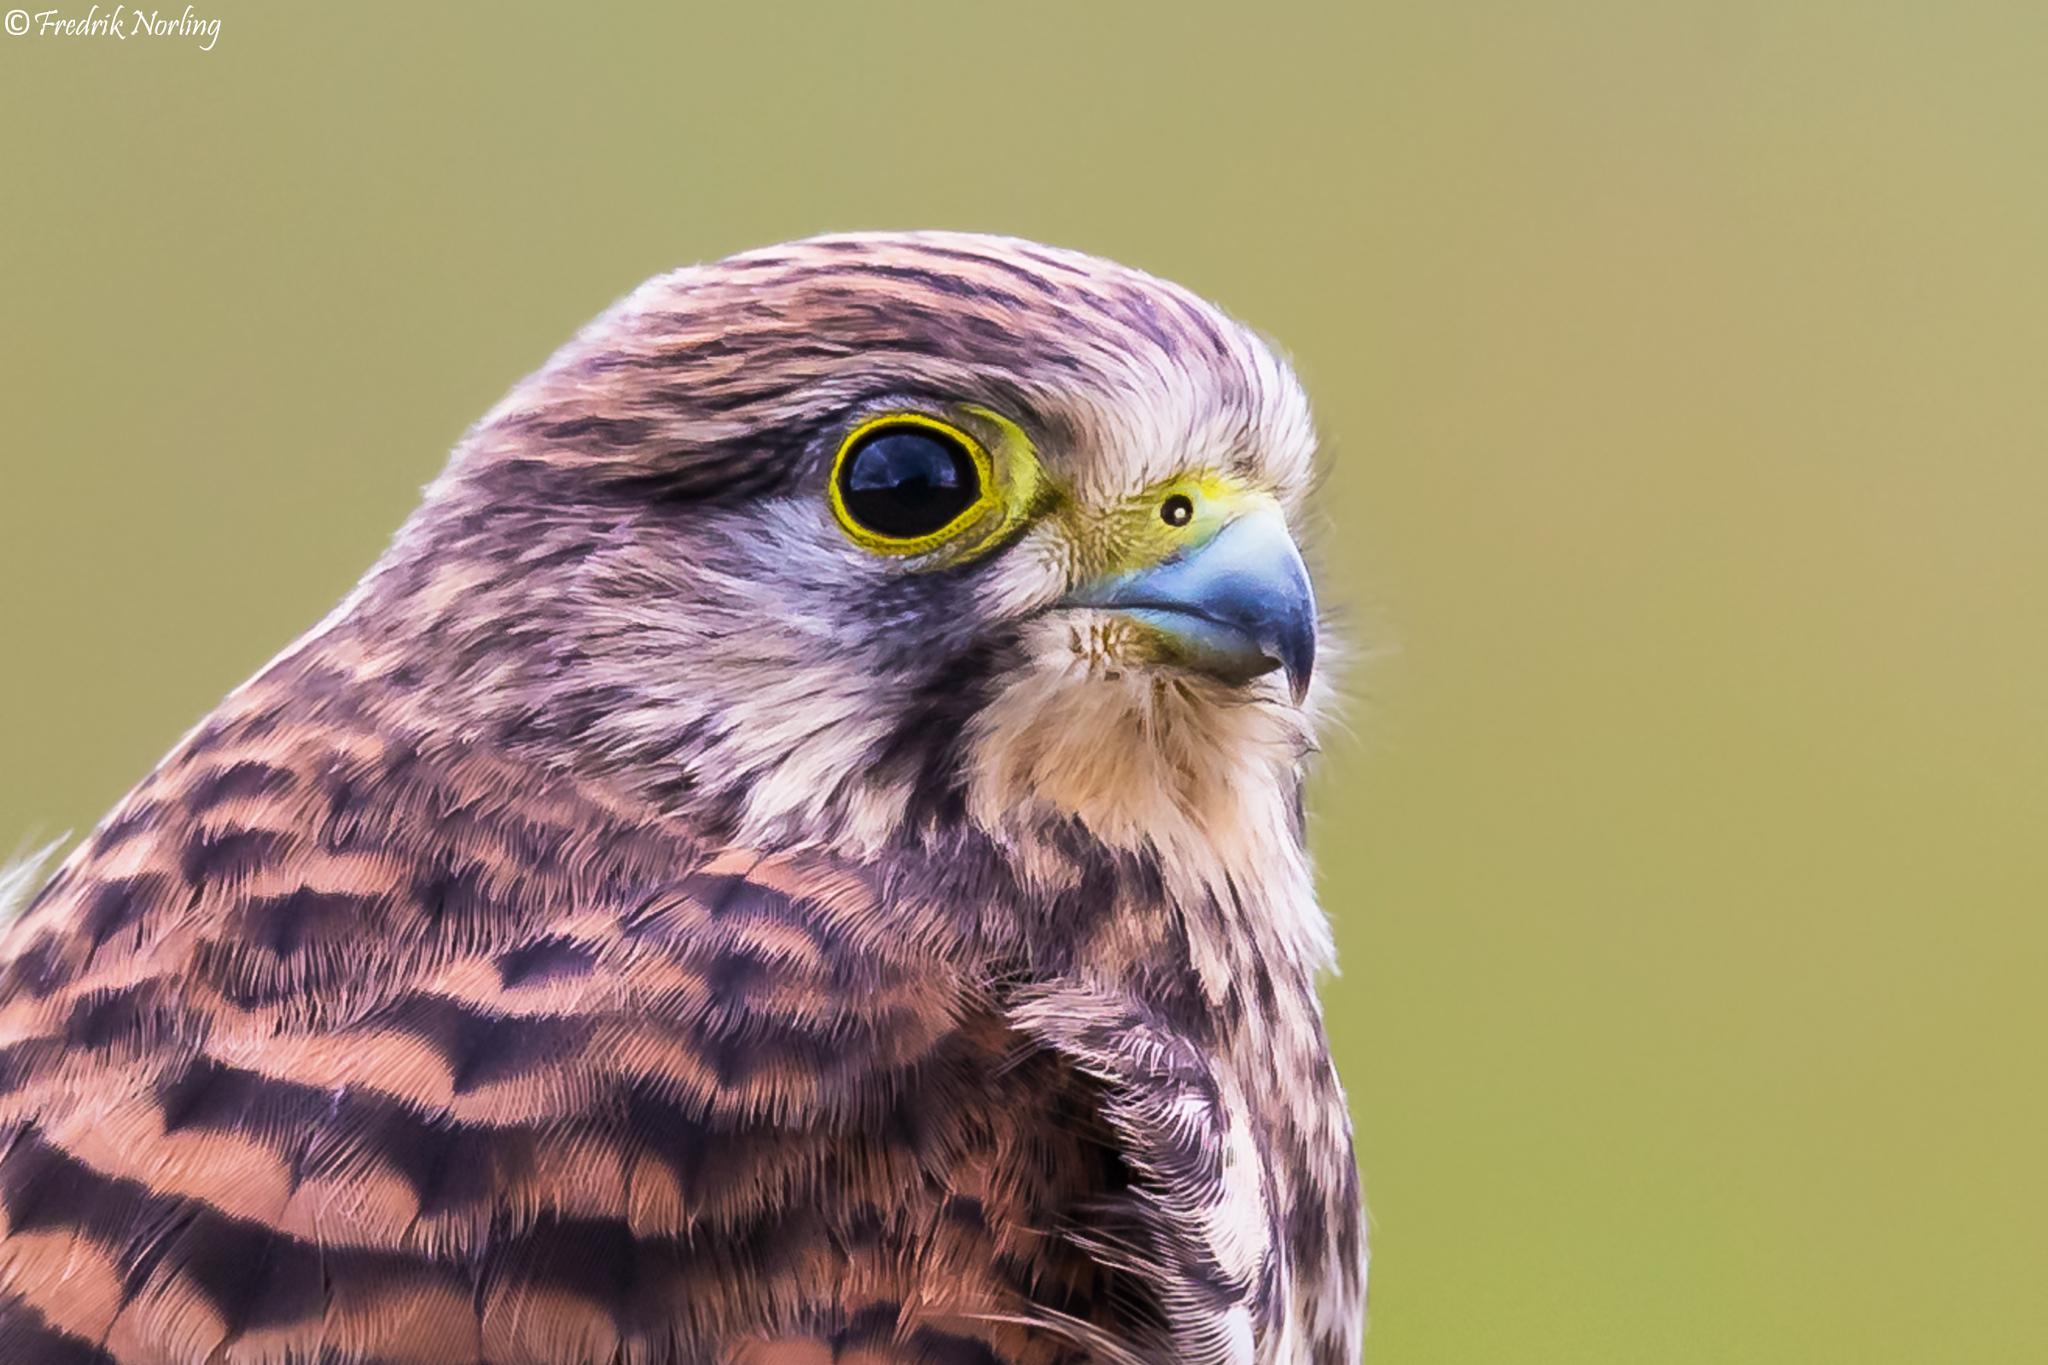 Juvenile Kestrel closeup by Fredrik Norling